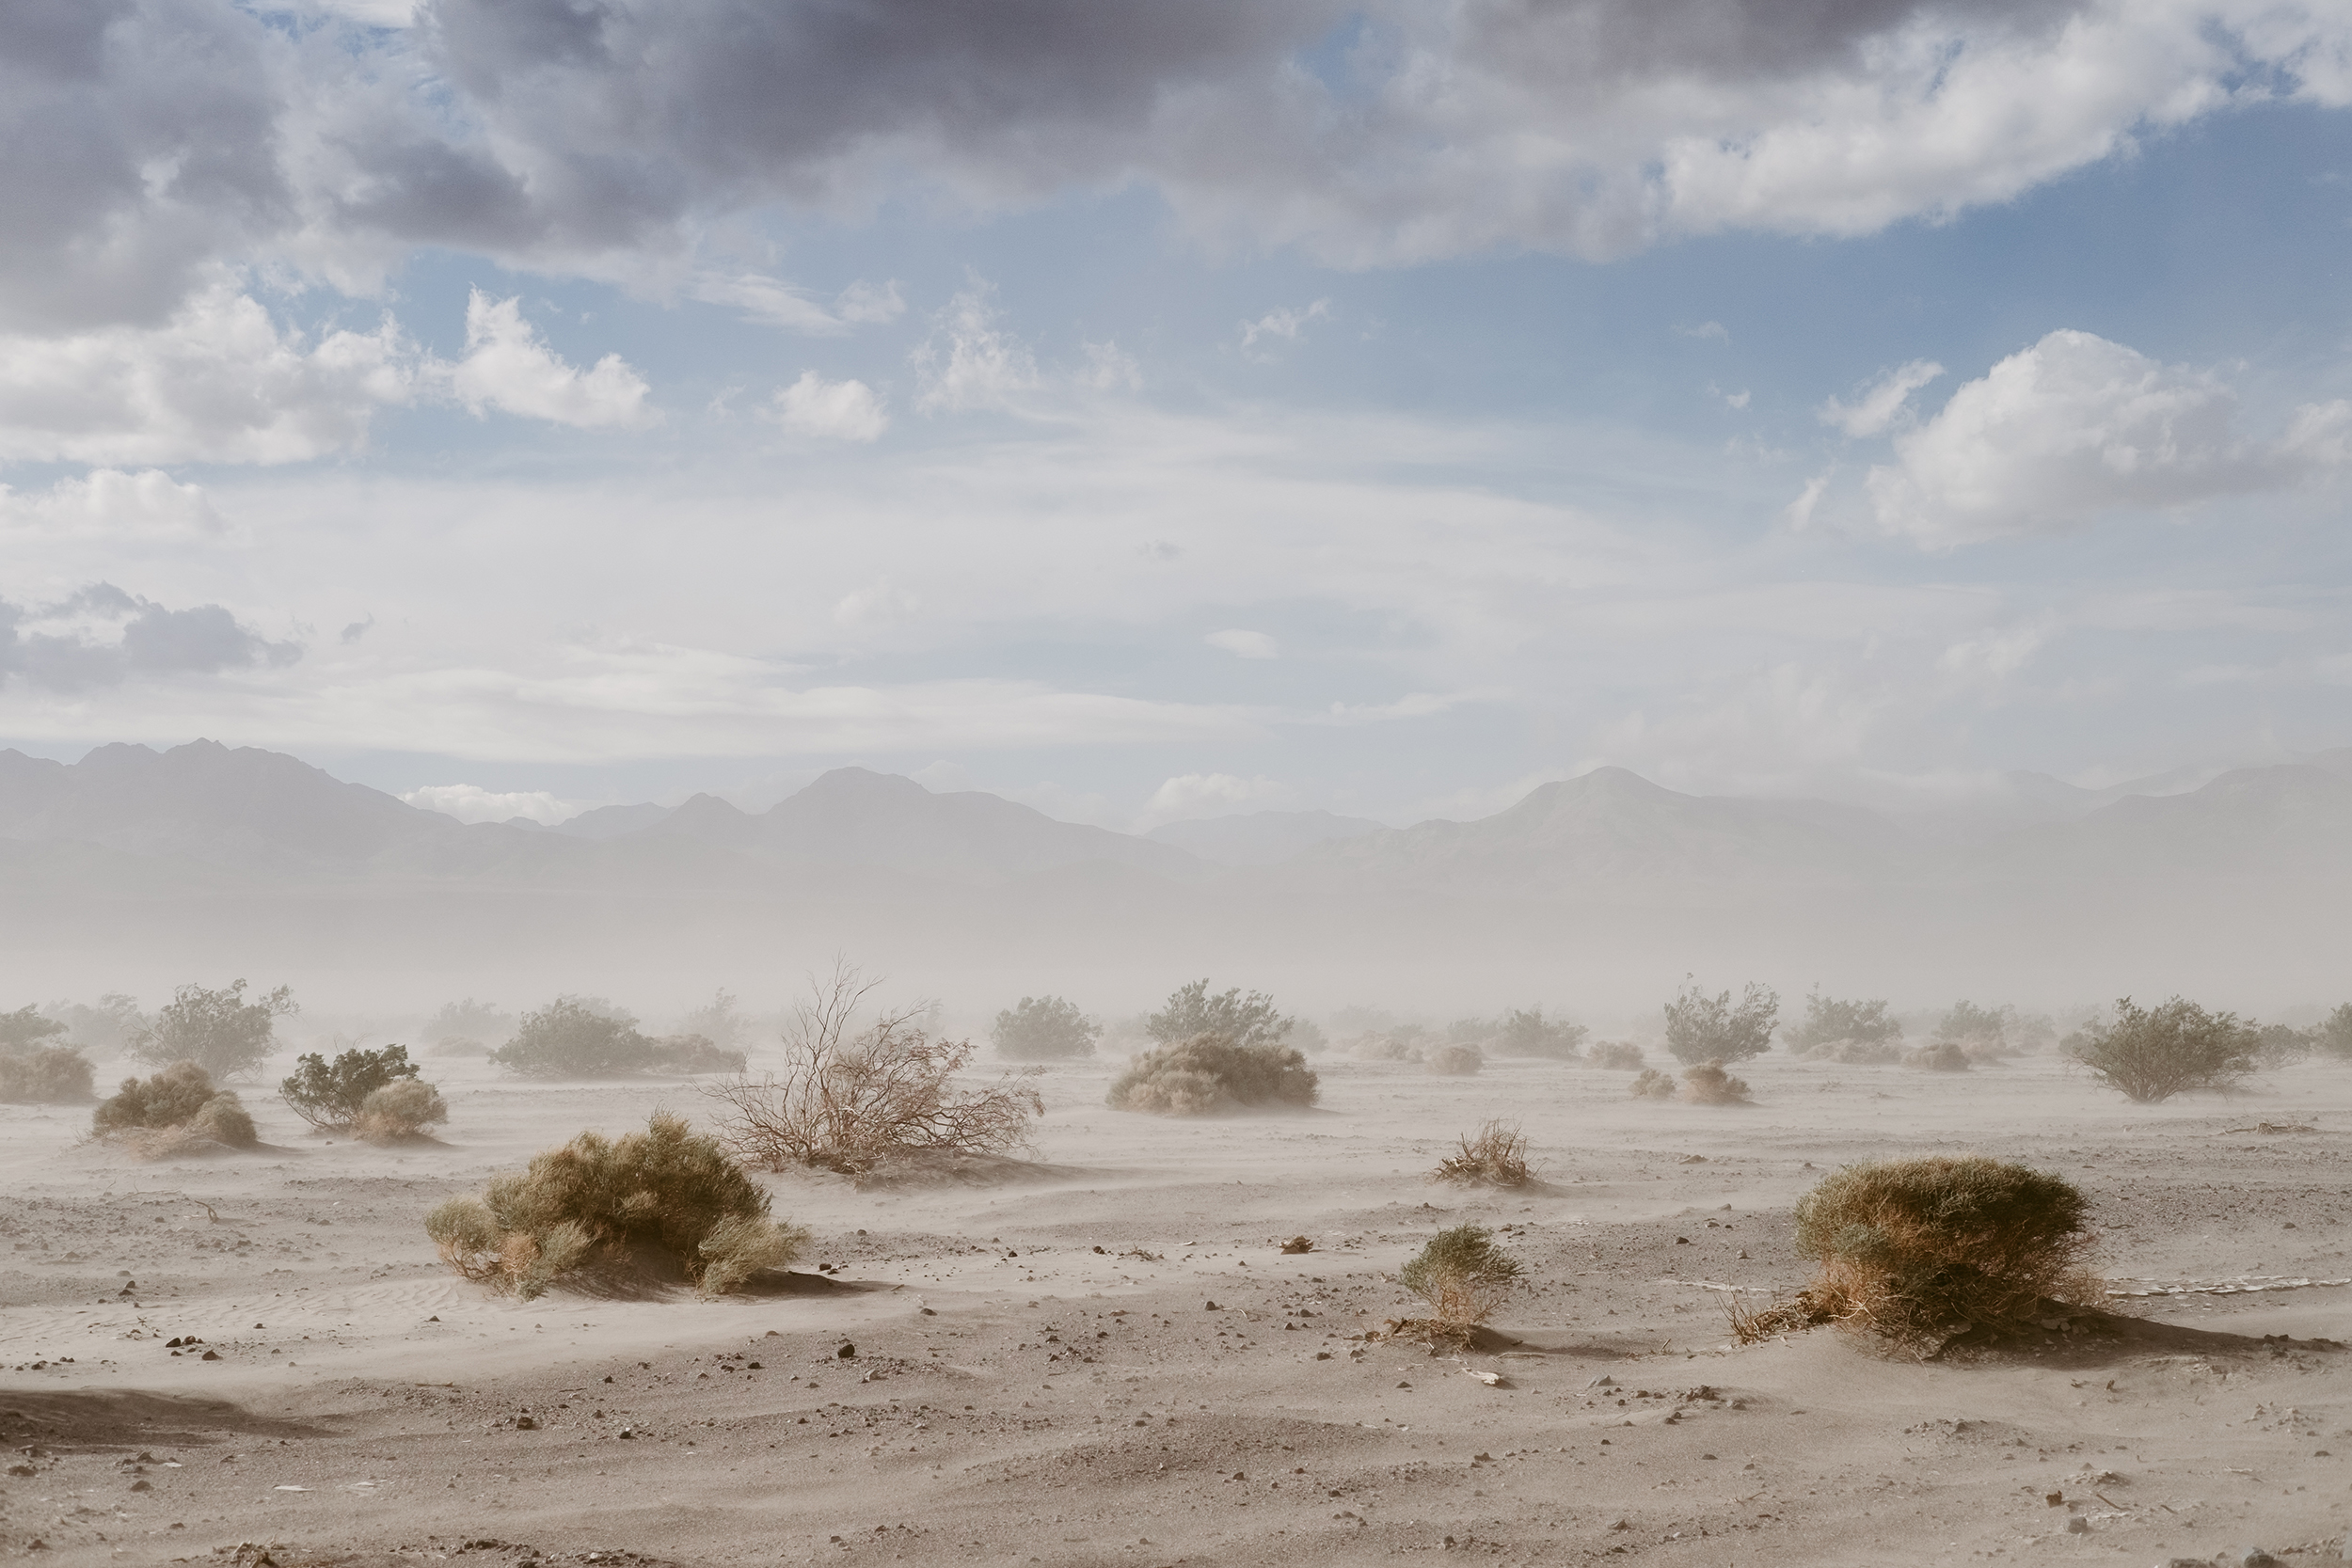 West Side Road, Death Valley National Park